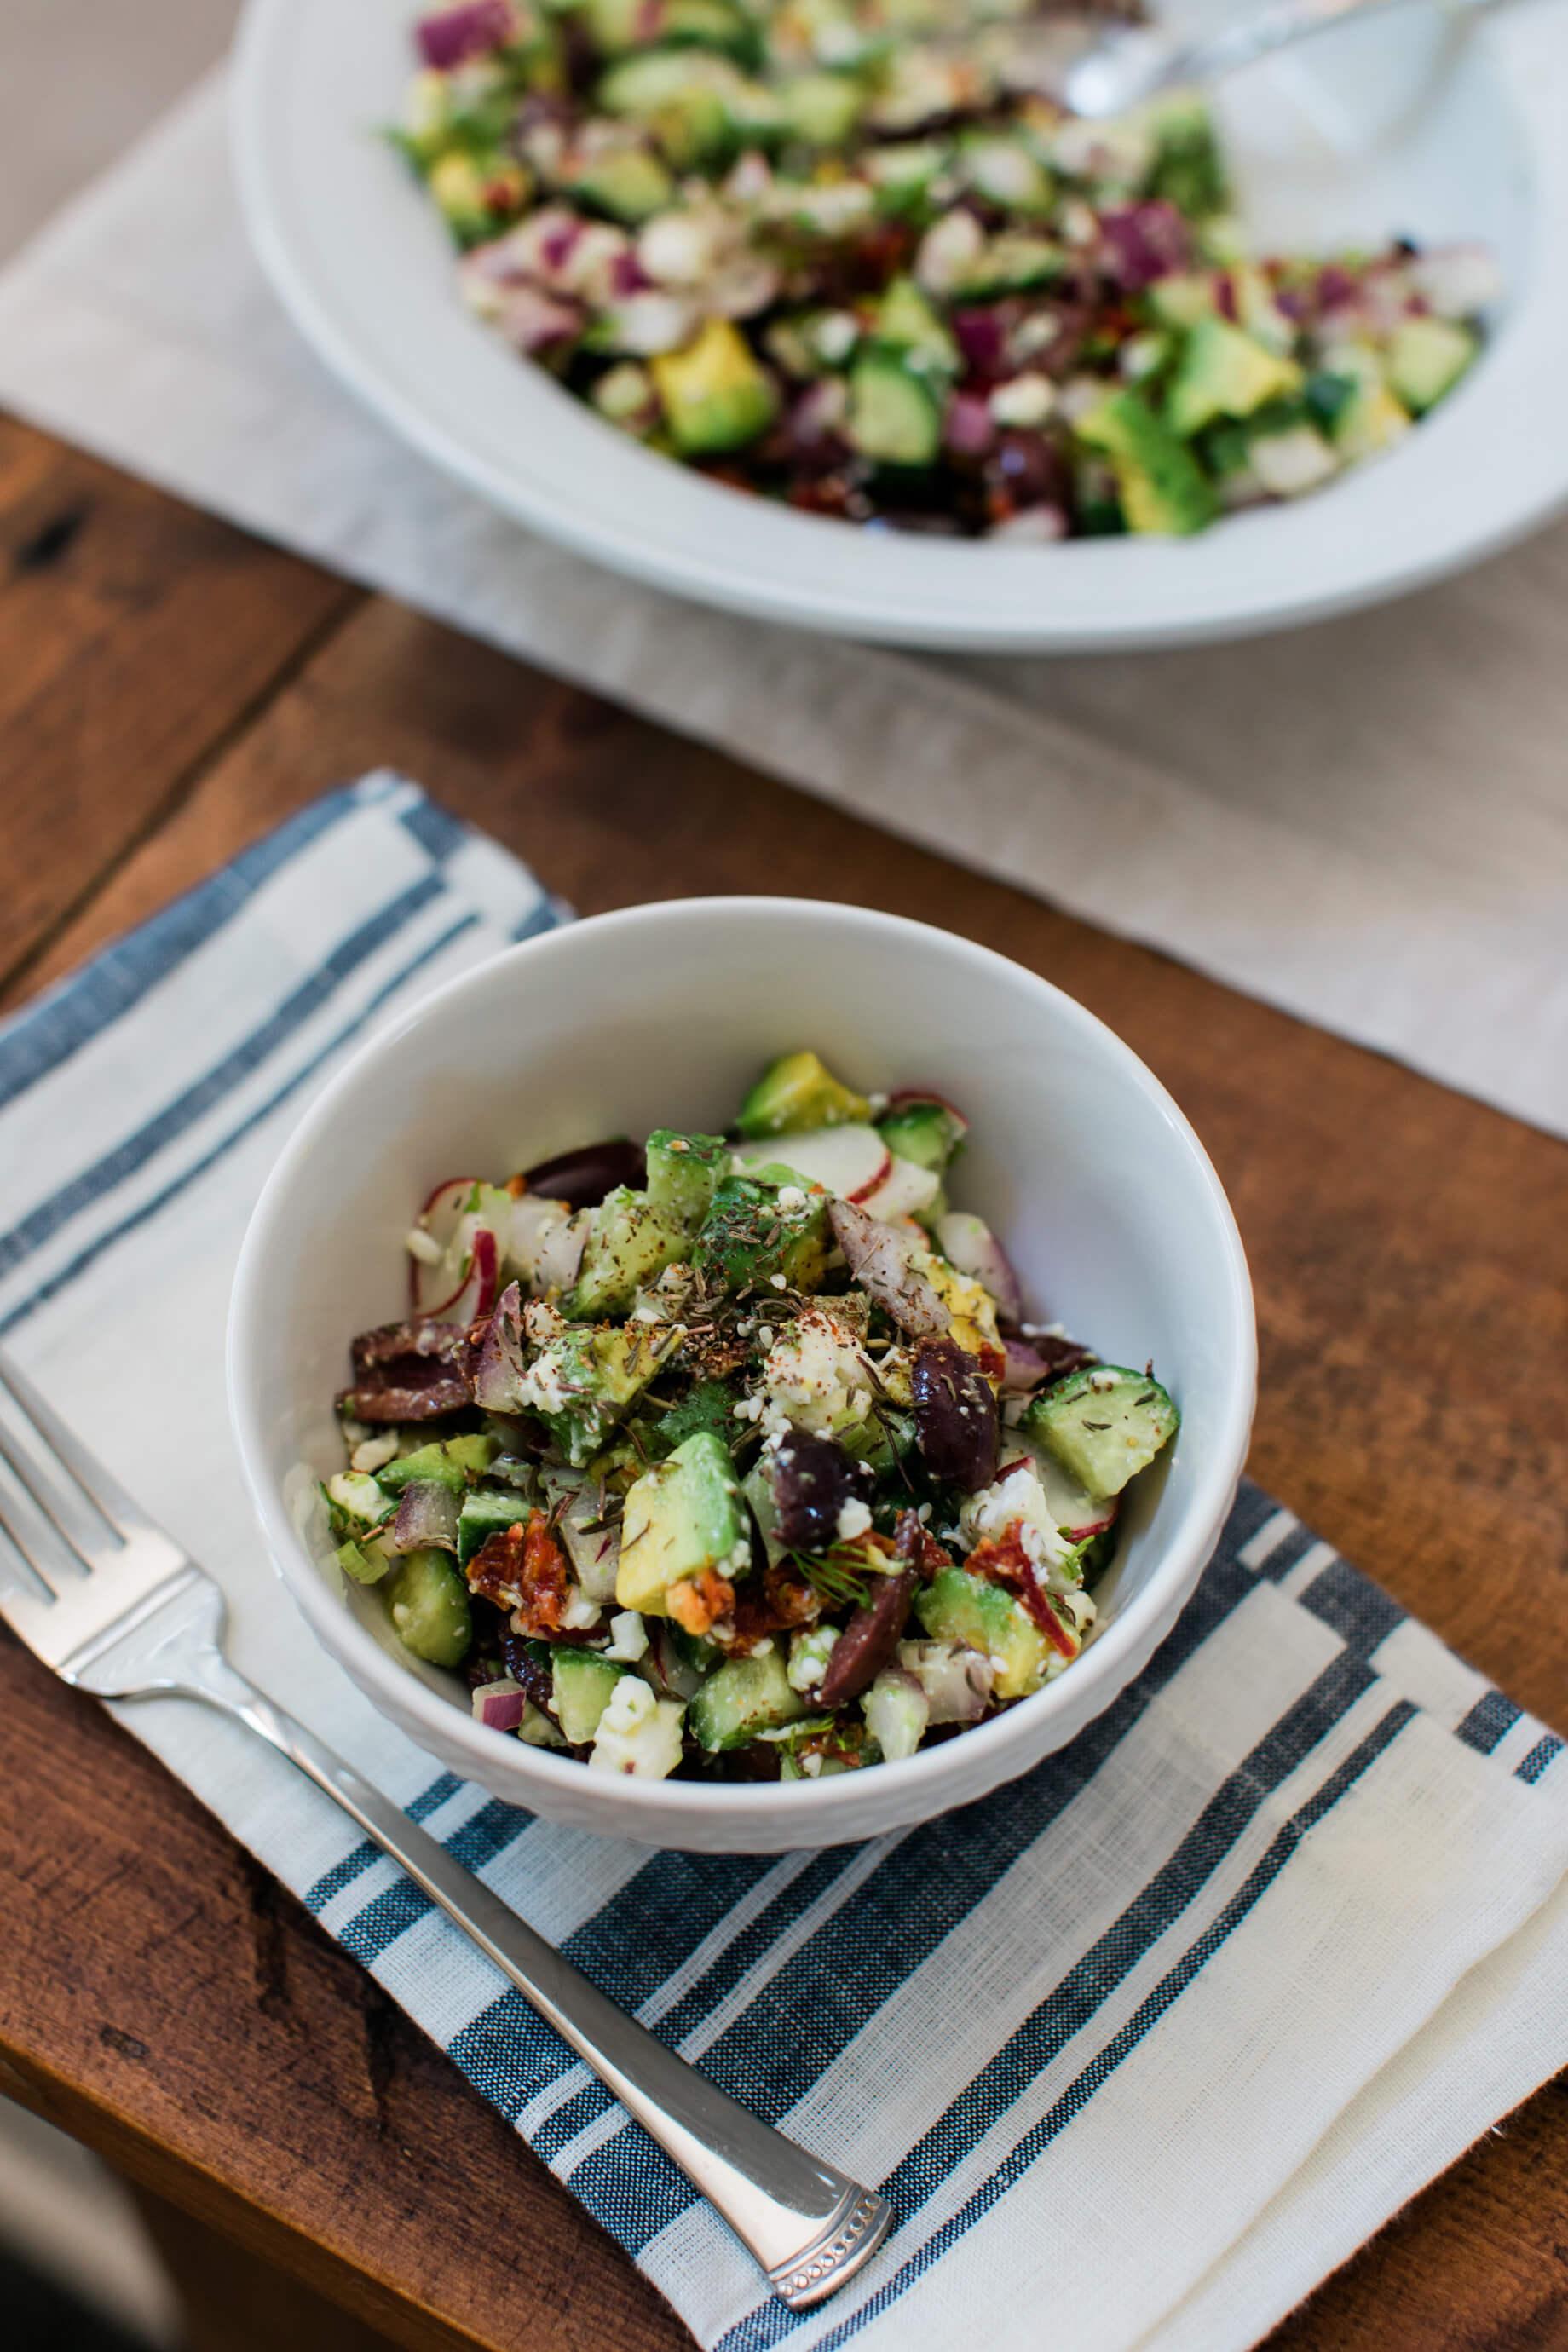 10 no heat summer recipes ideas including an avocado greek salad - M Loves M @marmar